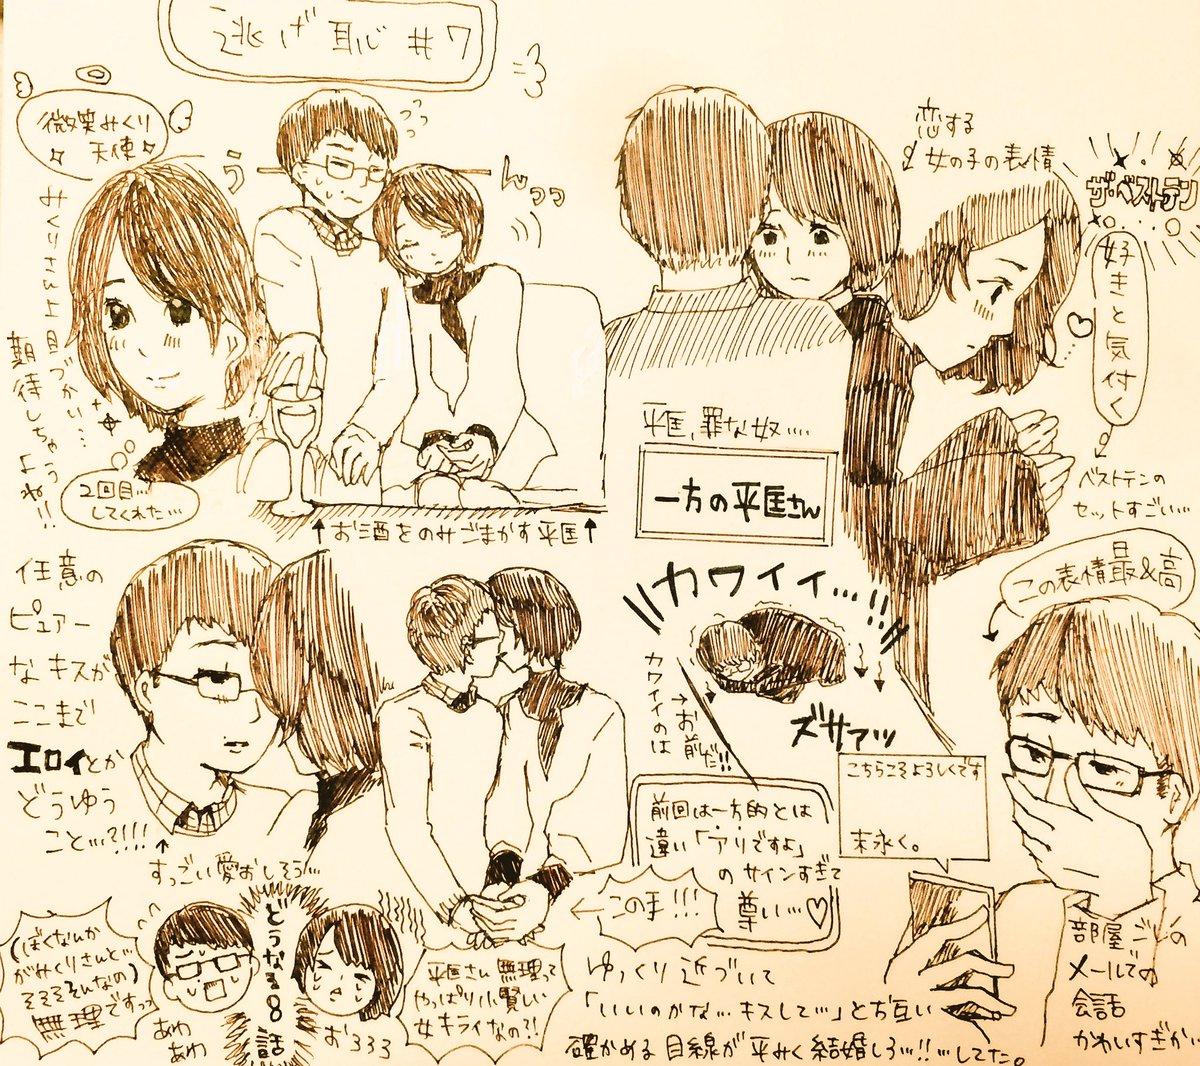 tweet : 【逃げ恥】でも大流行!ファンイラスト「#逃げ絵」(随時更新